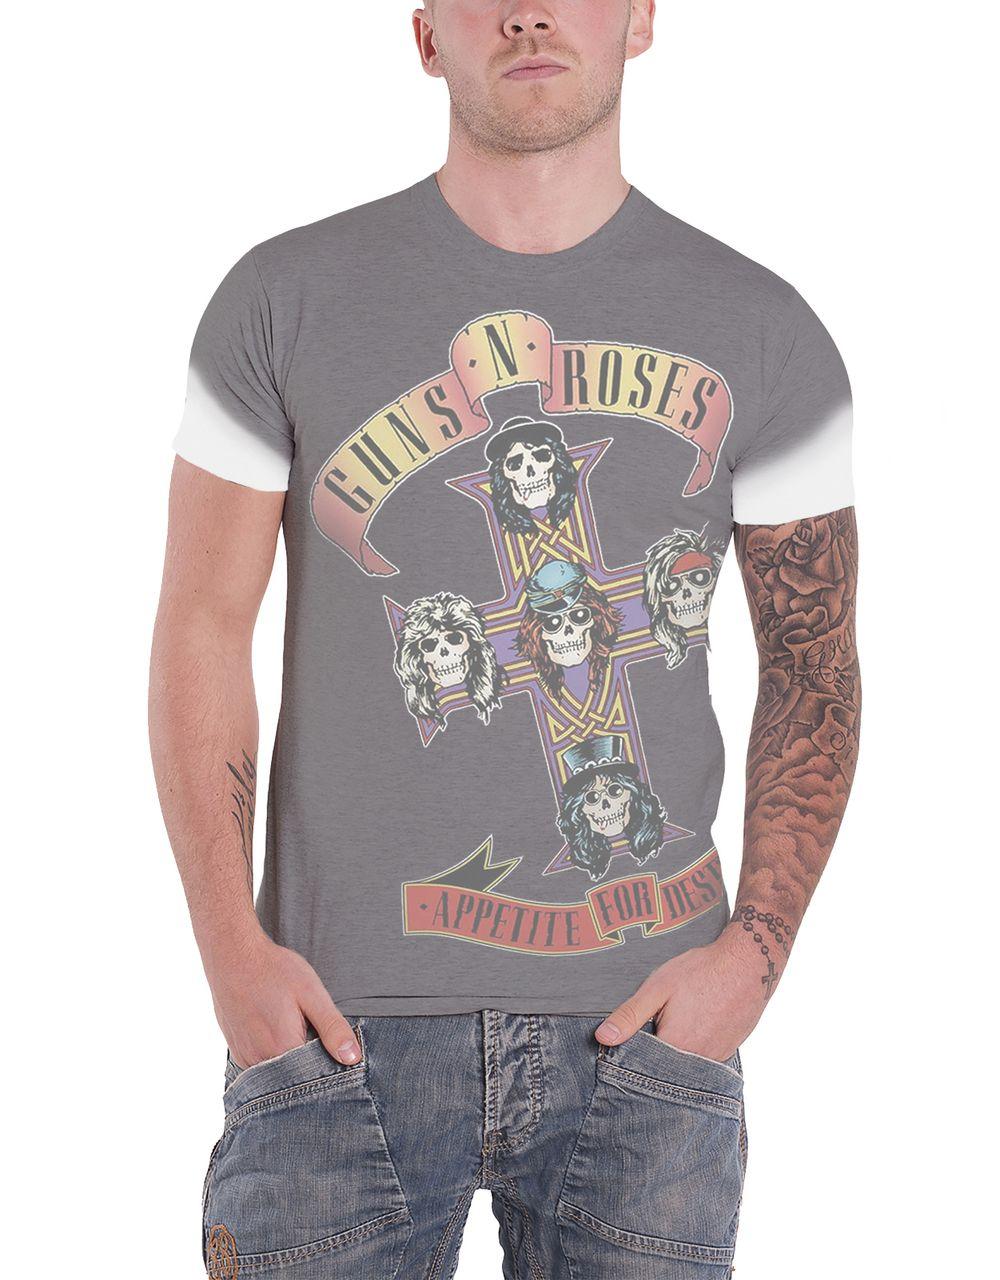 f1dcf9922cb Guns N Roses T Shirt Appetite for Destruction Mens White Sub Dye - Paradiso  Clothing